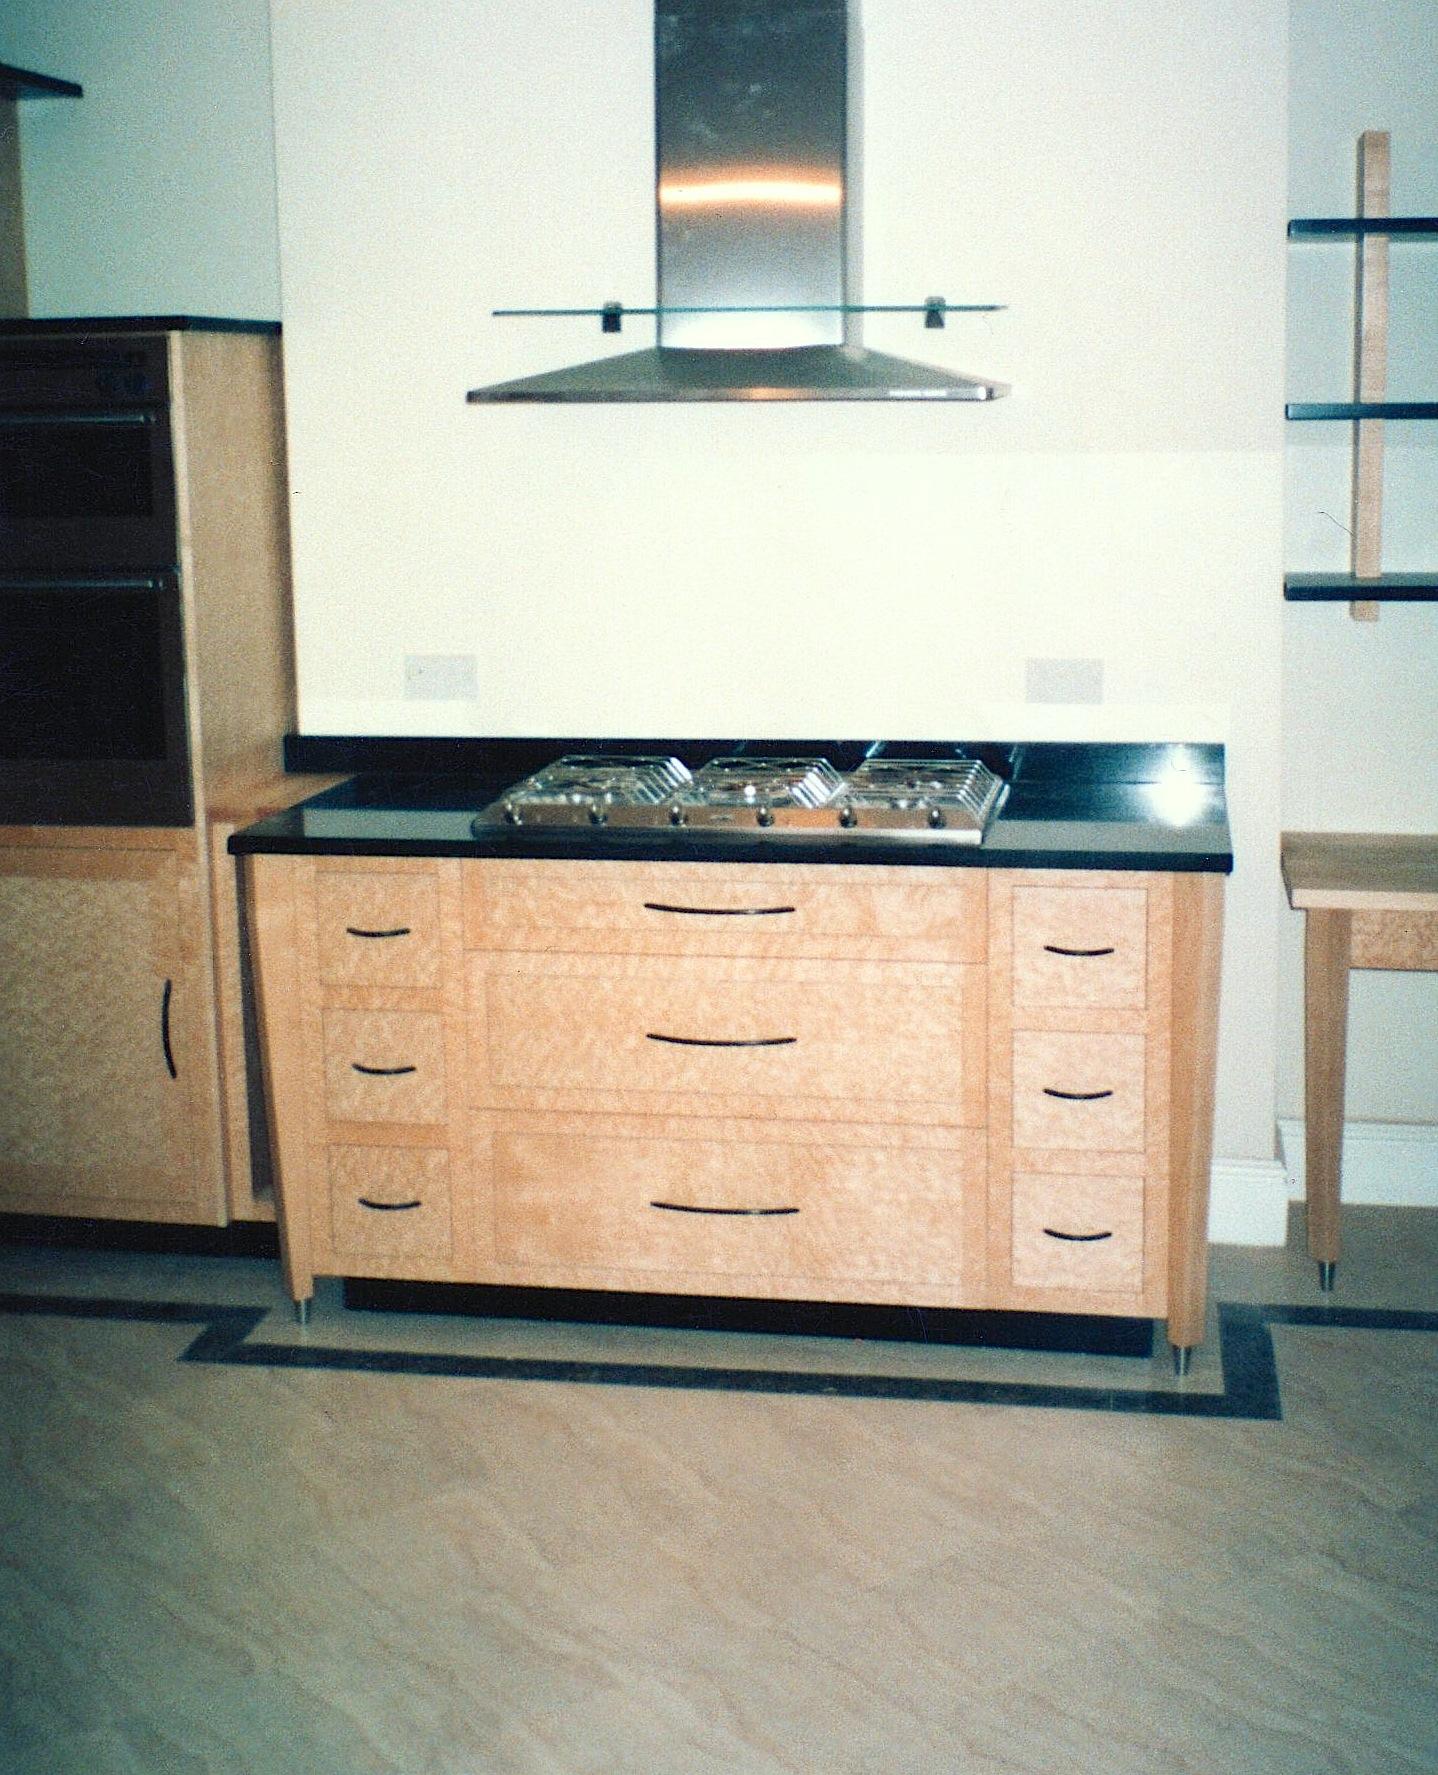 Birds-Eye-Maple-And-Granite-Kitchen